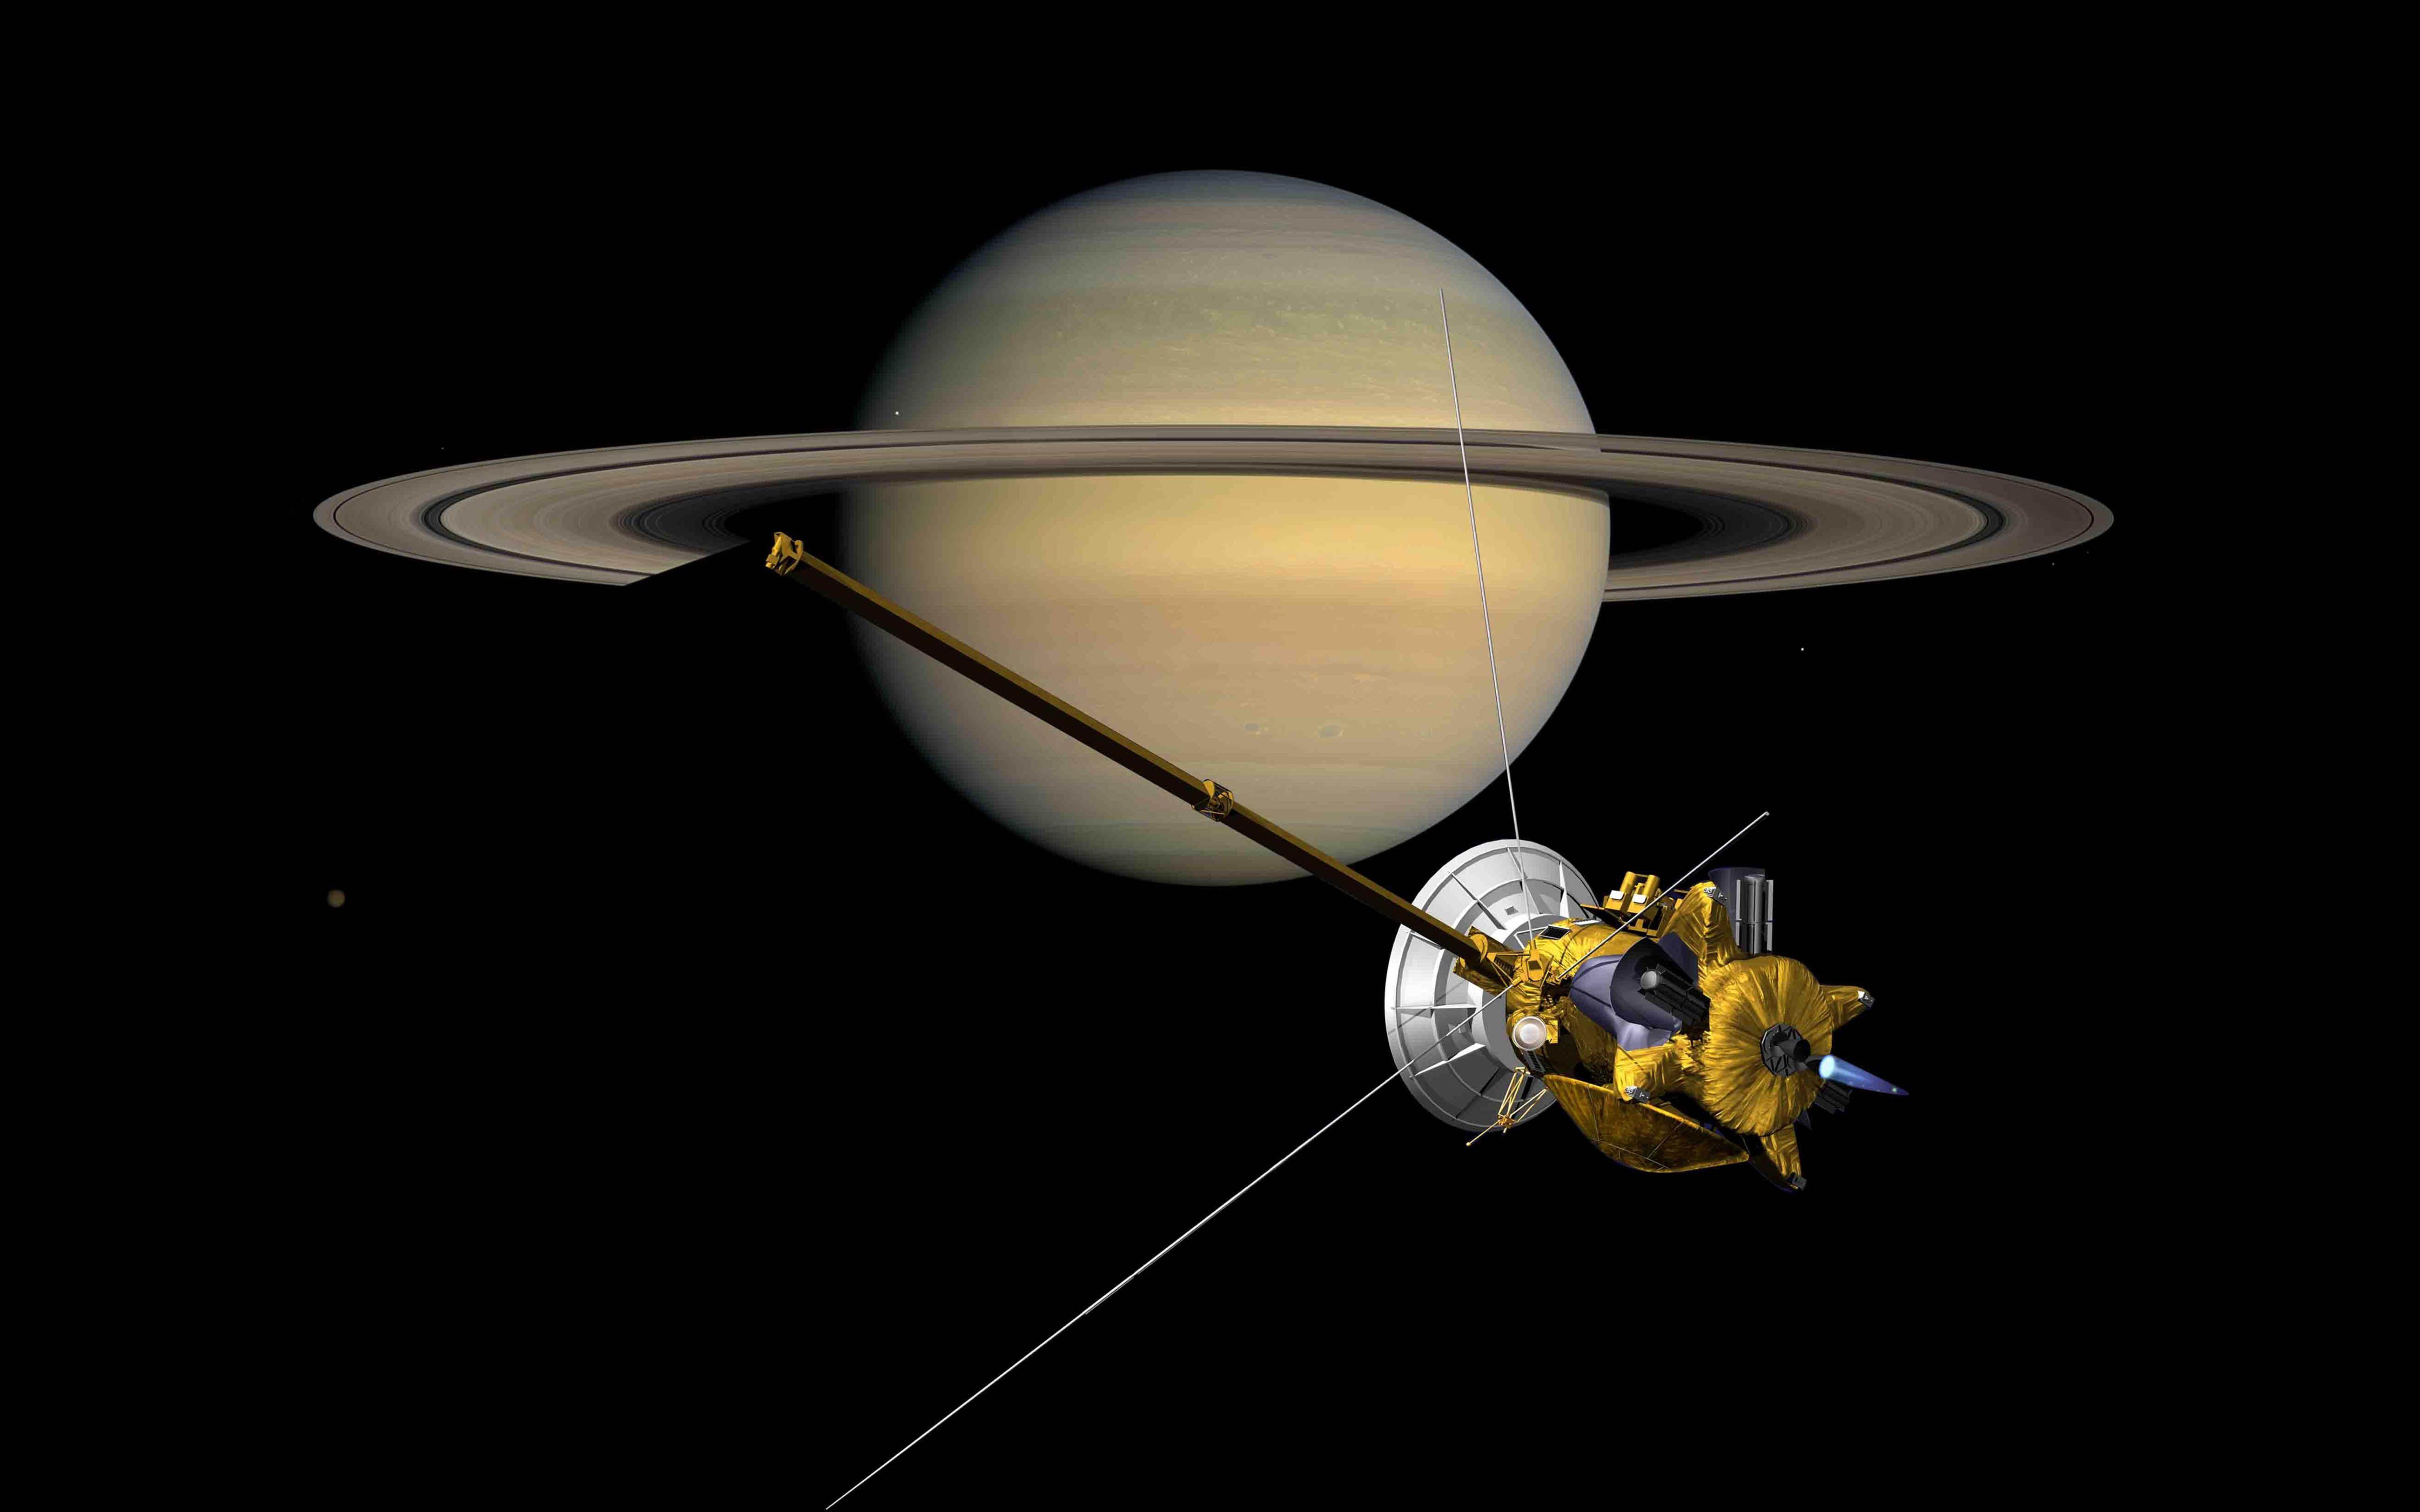 serie nasas cassini spacecraft - HD4613×3600